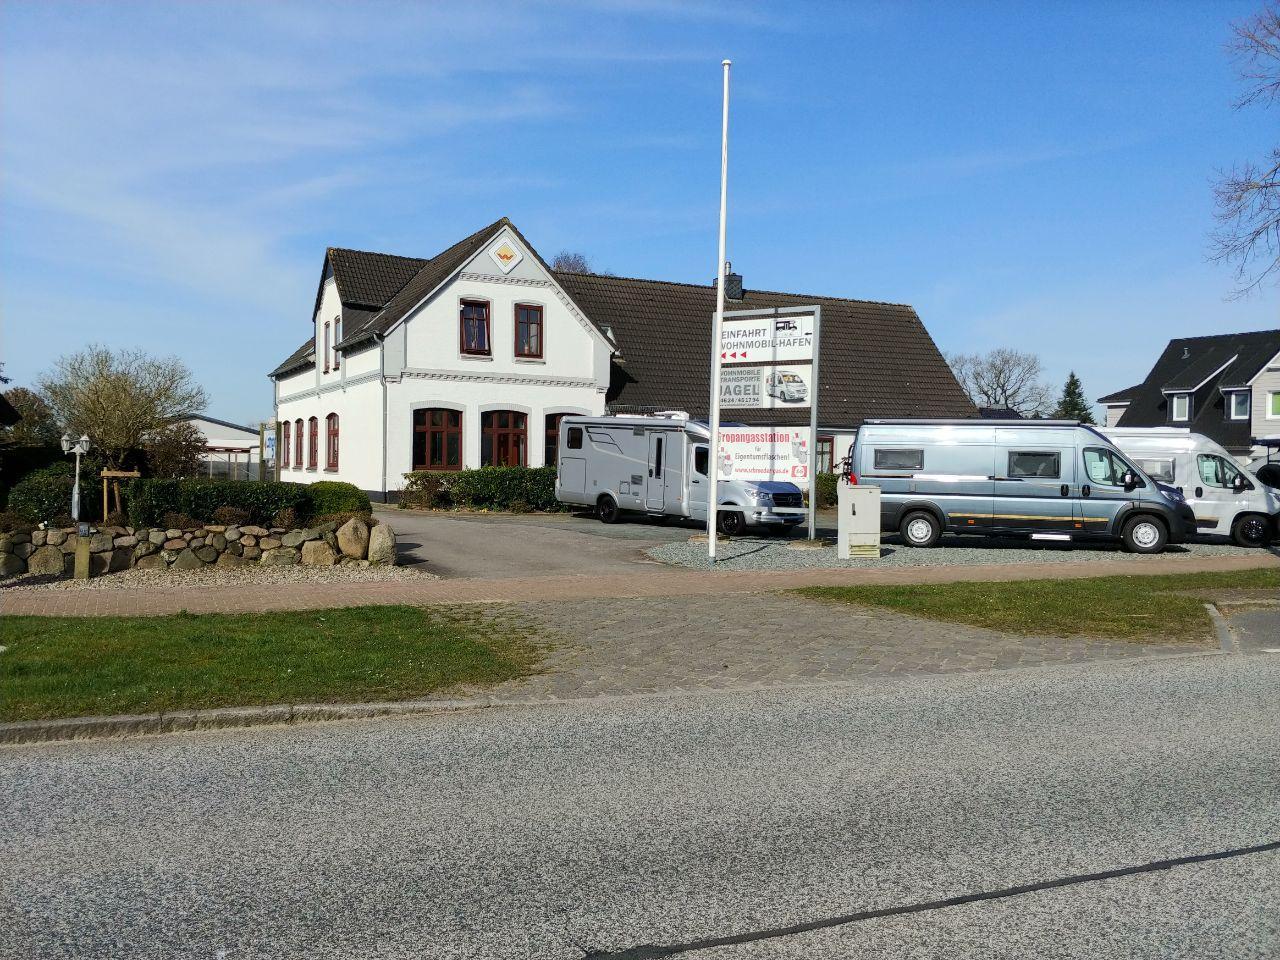 Wohnmobilhof Jagel Werkstatt